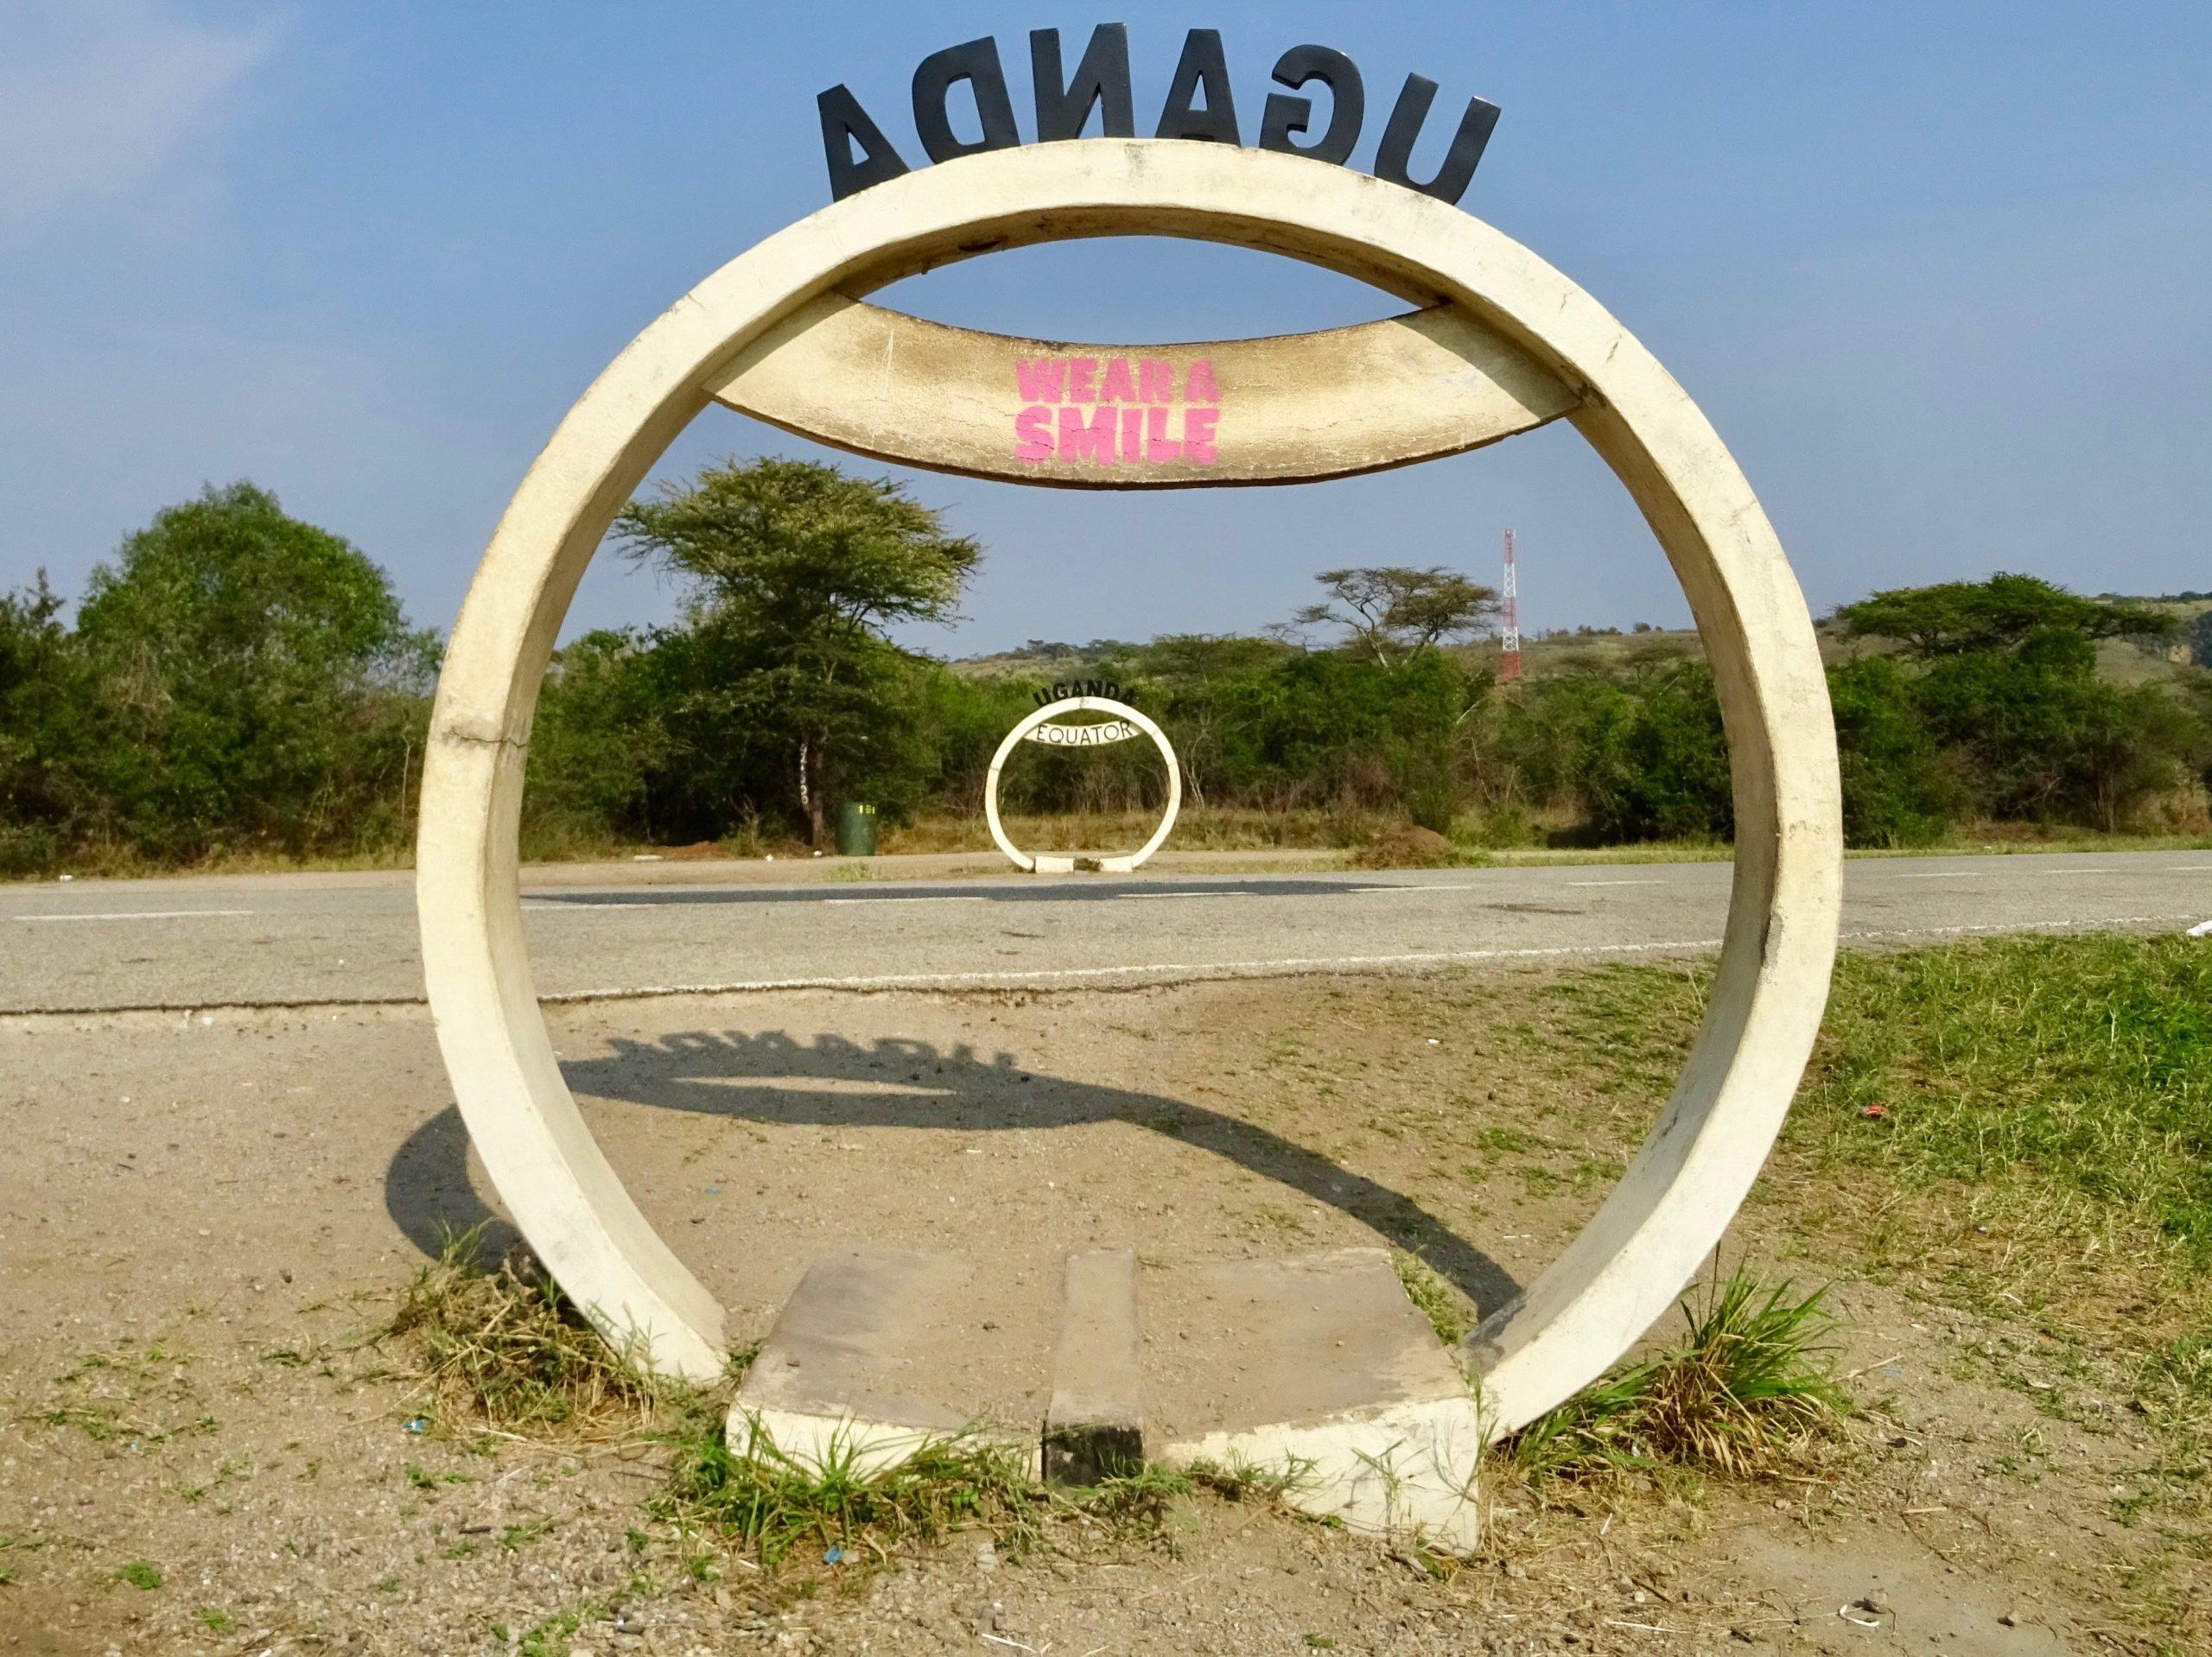 Draag een glimlach op de evenaar nabij Kikorongo, Oeganda